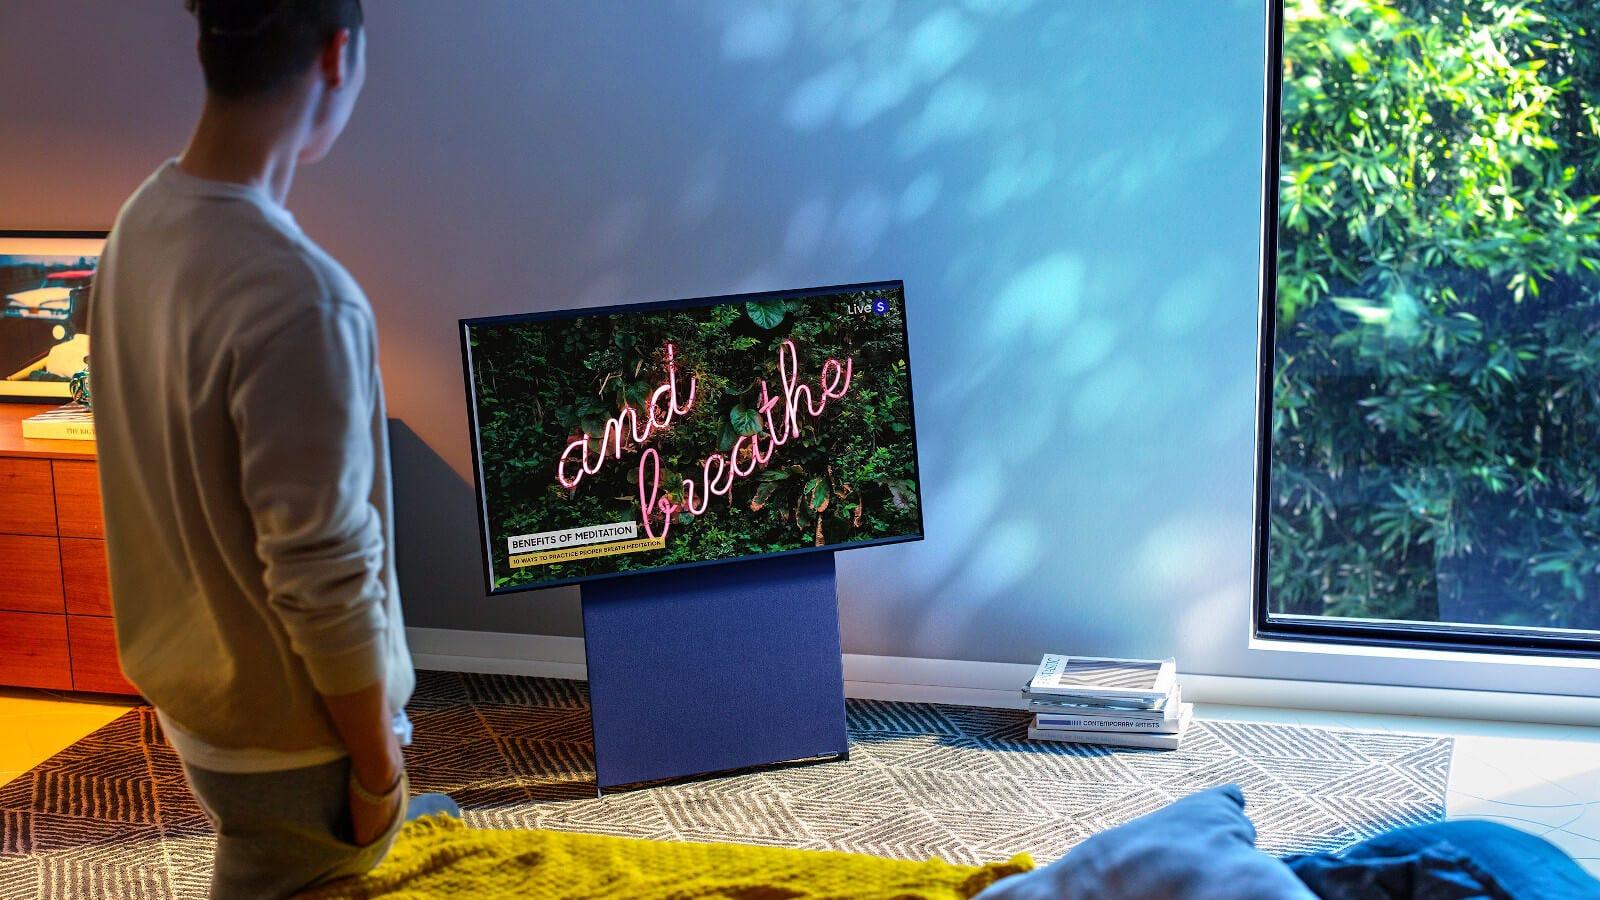 Samsung Sero TV shown horizontally